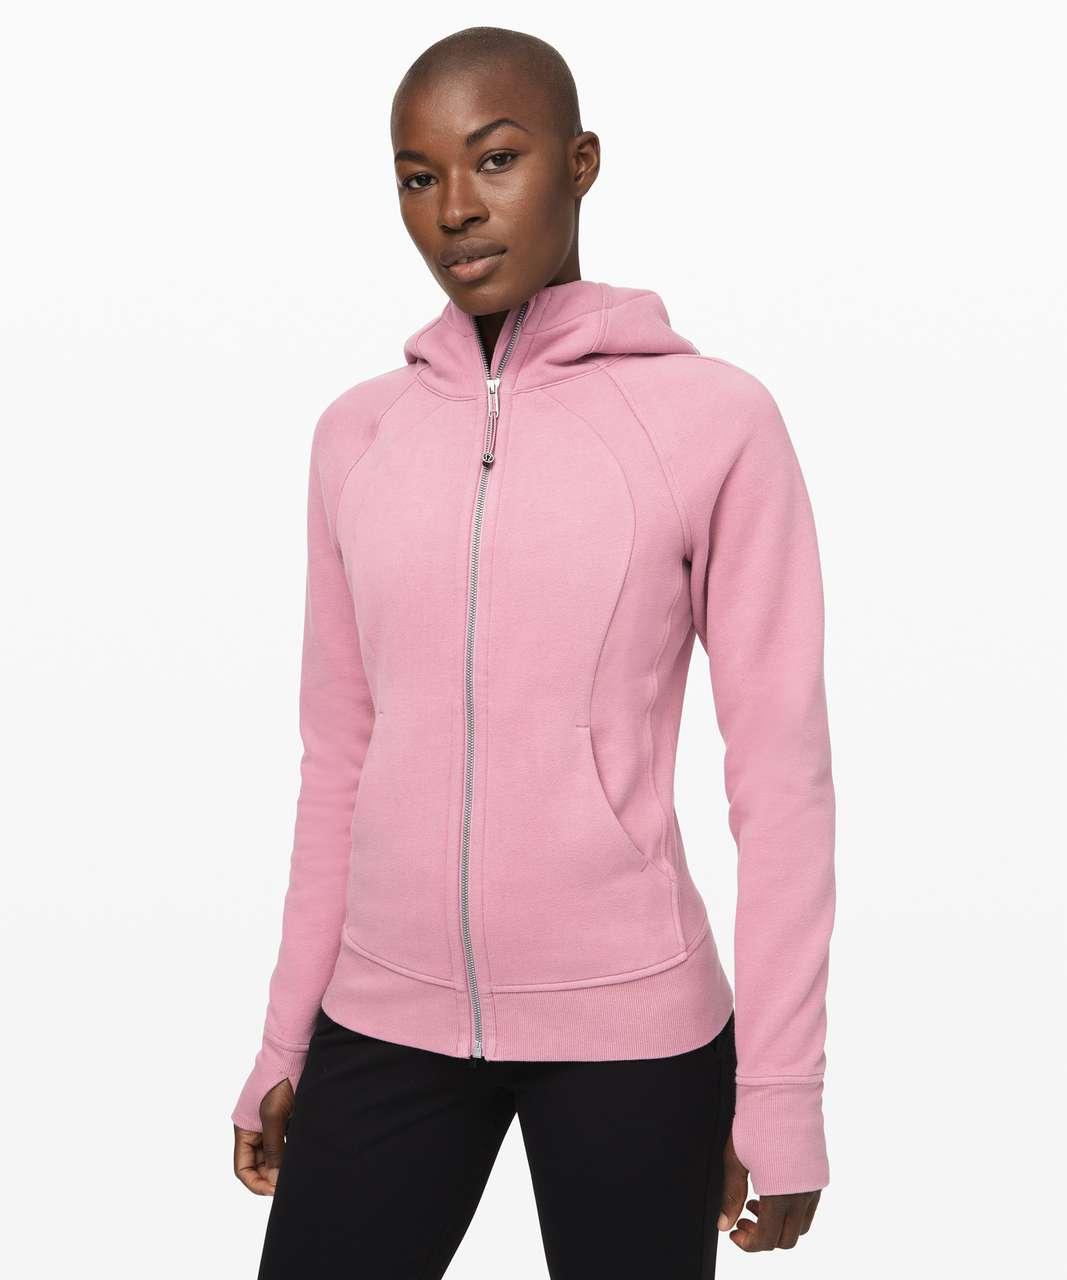 Lululemon Scuba Hoodie *Light Cotton Fleece - Pink Taupe